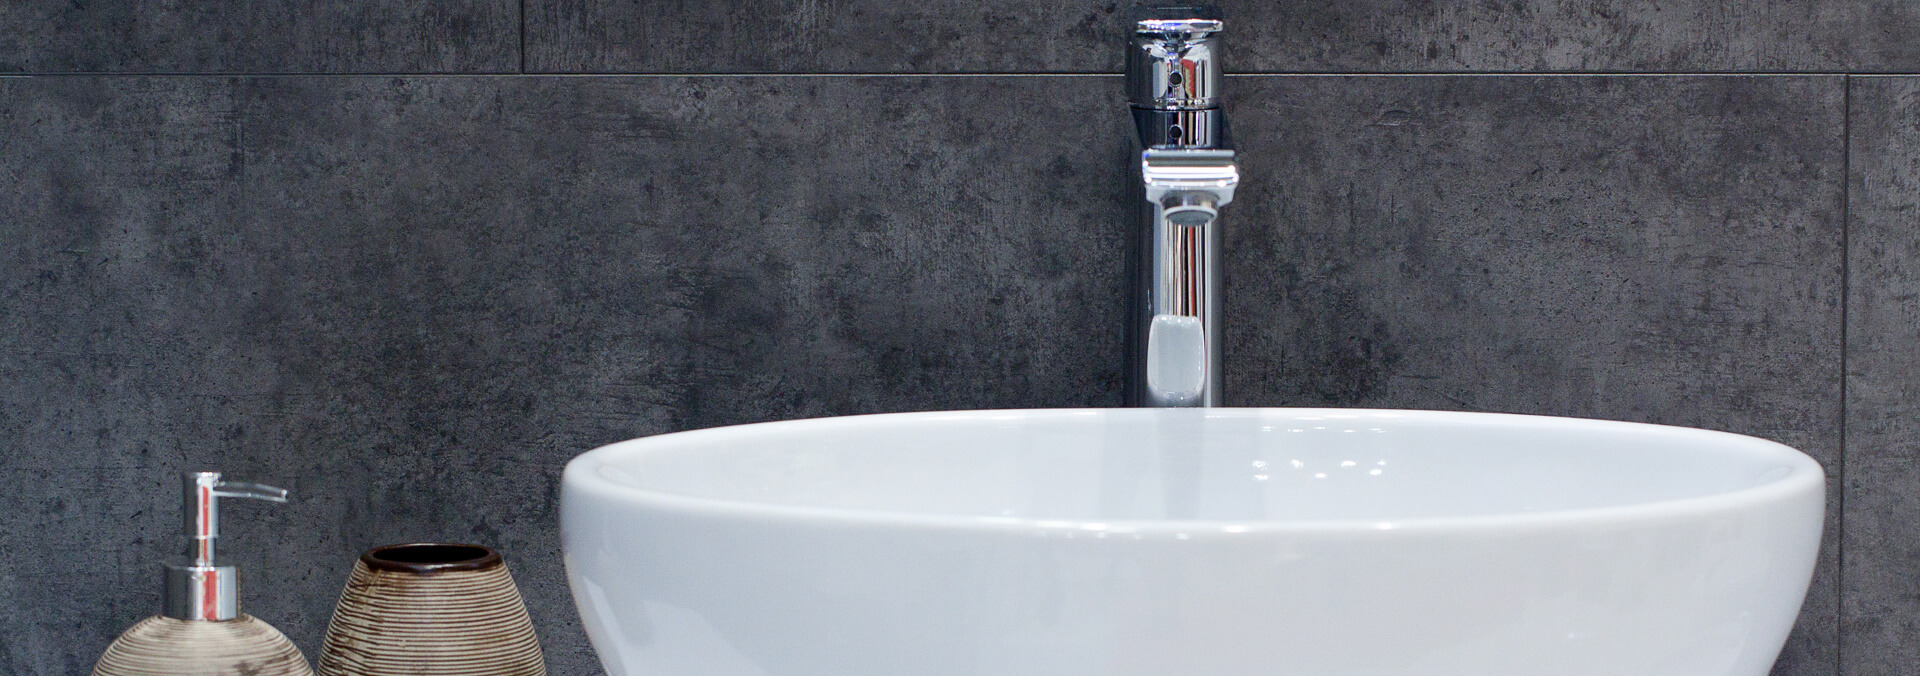 We Build Fantastic Bathrooms